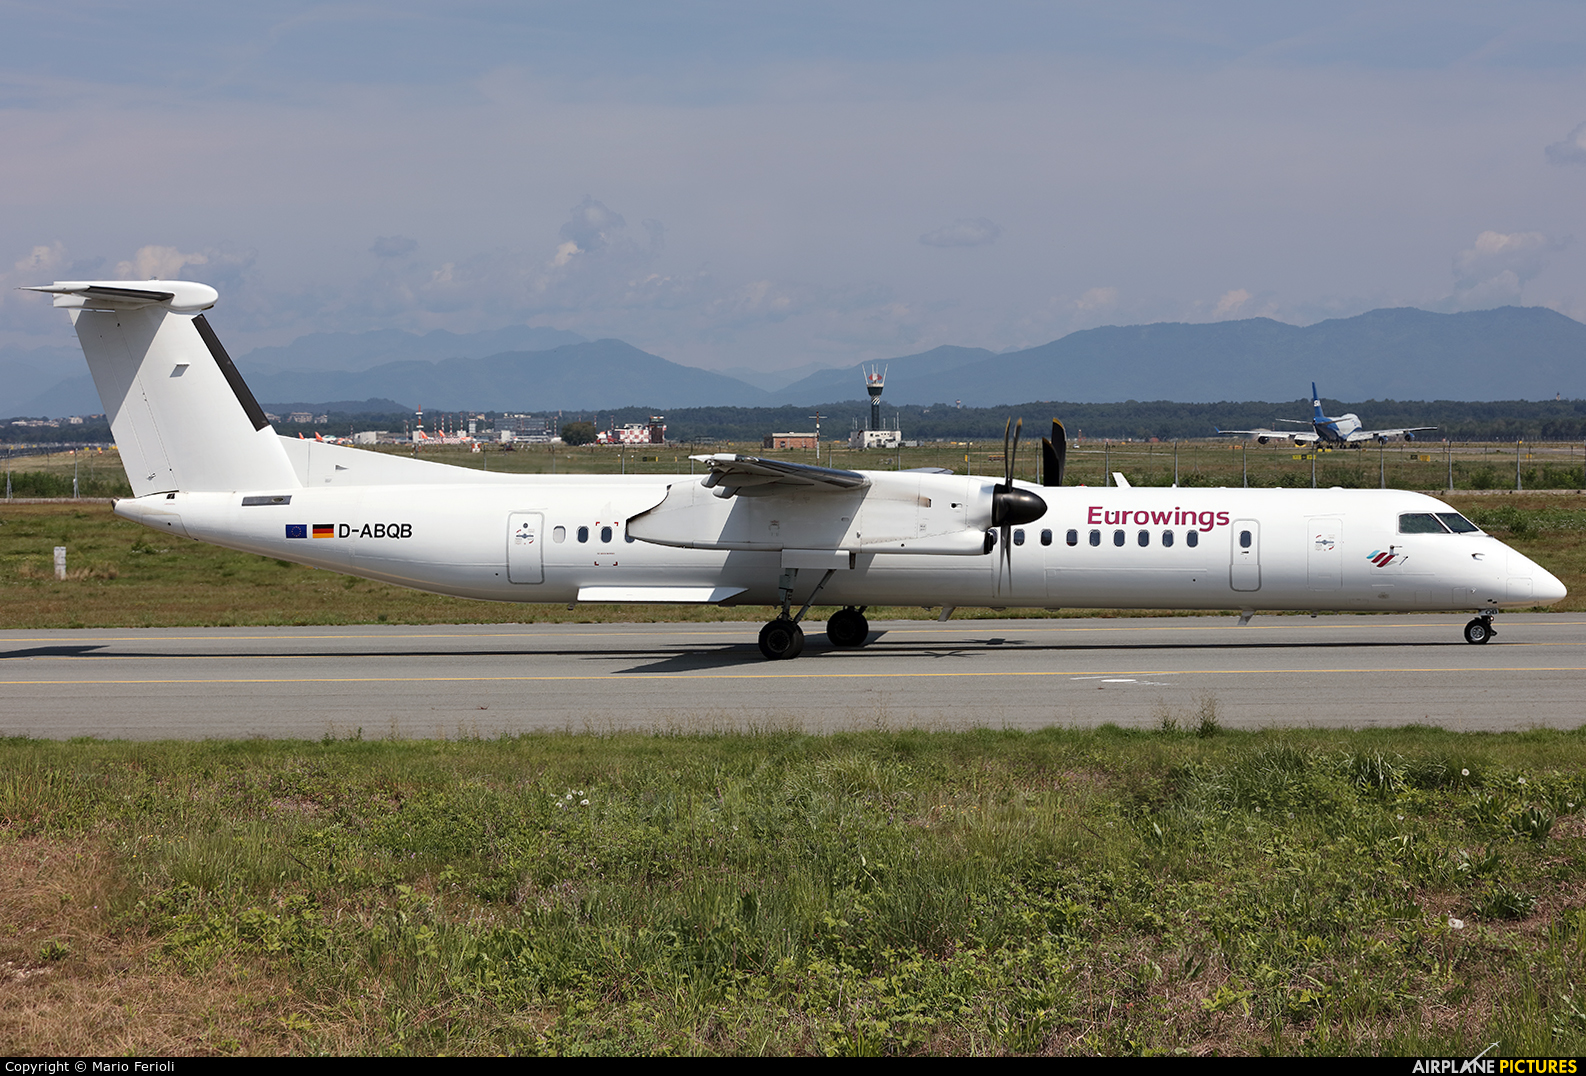 Eurowings D-ABQB aircraft at Milan - Malpensa